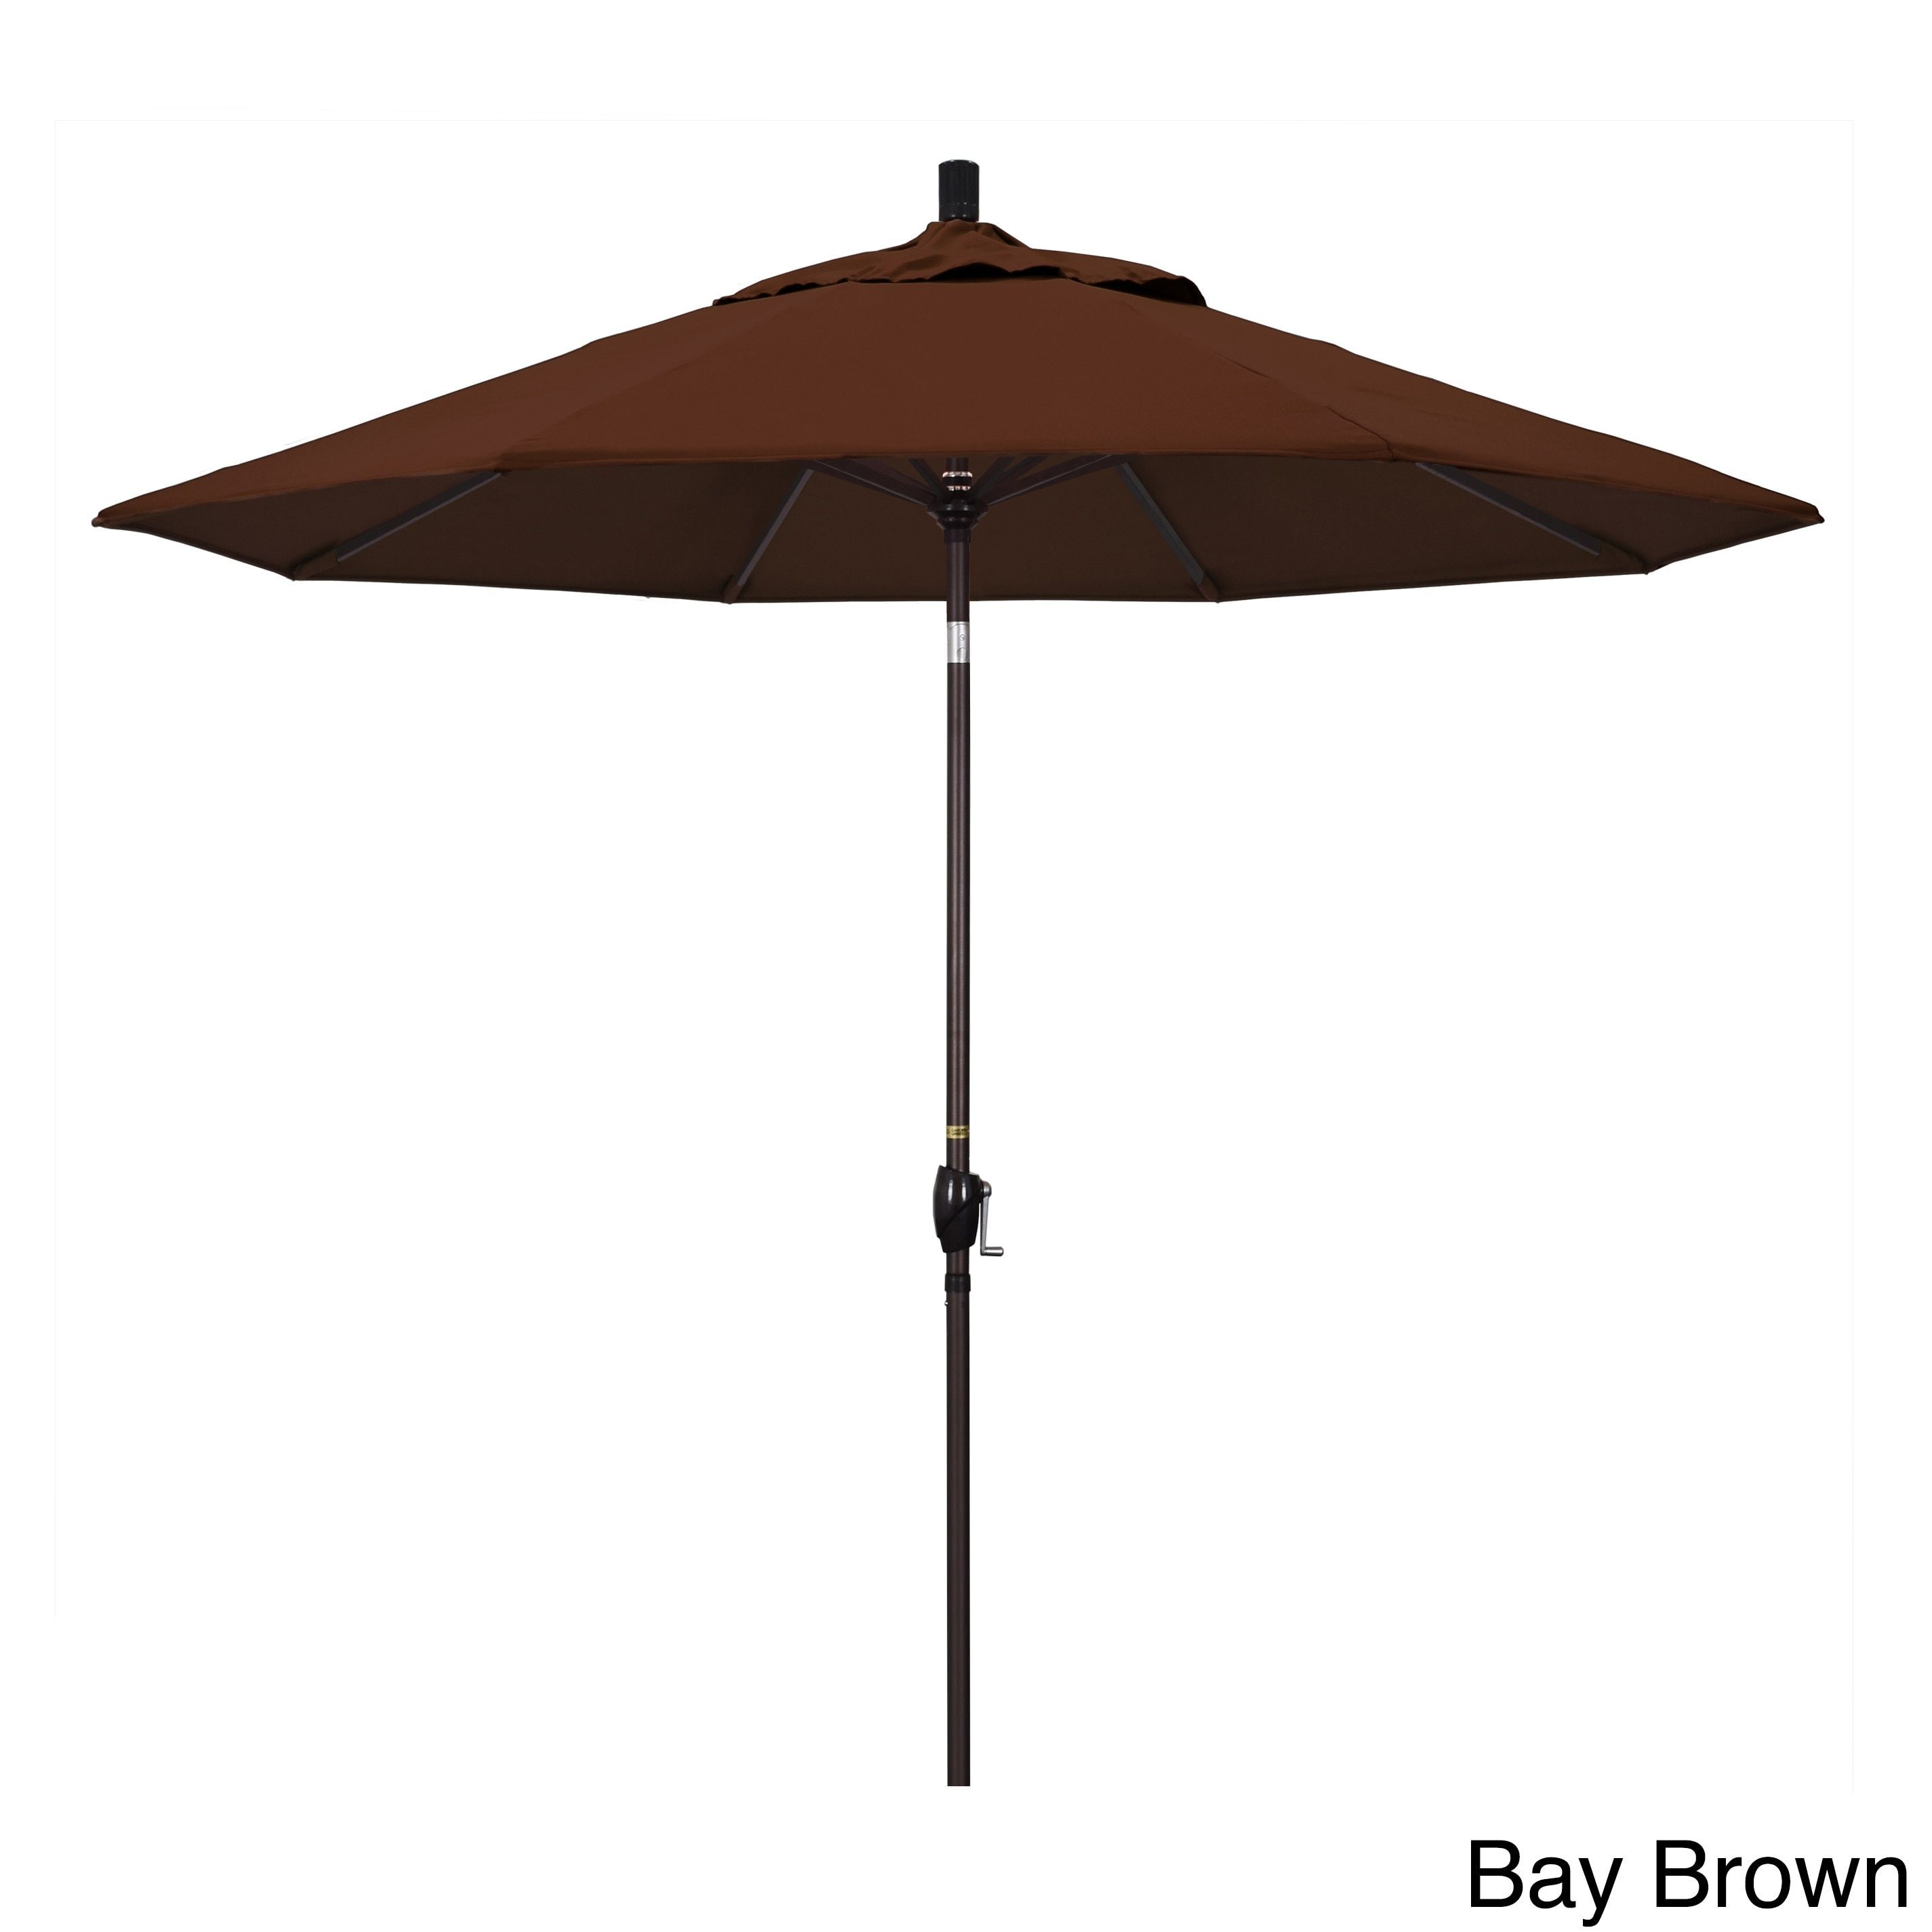 California Umbrella 9' Rd. Market Umbrella, Crank Lift with Push Button Tilt, Bronze Finish, Sunbrella Fabric